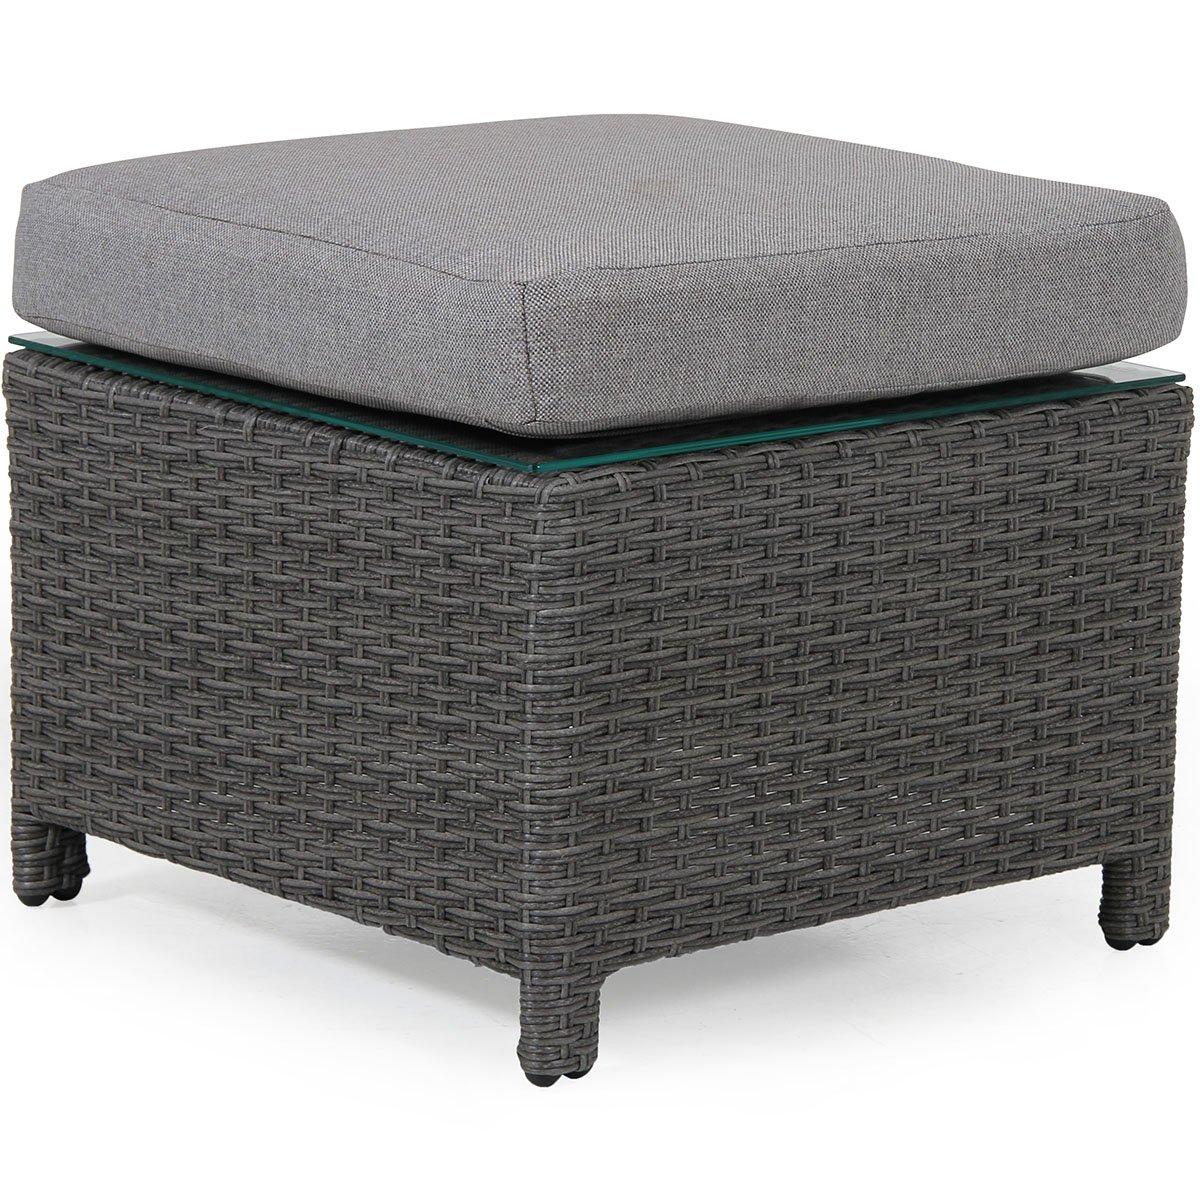 Soho grey пуф-стол, Brafab, артикул 2321S-76-76.